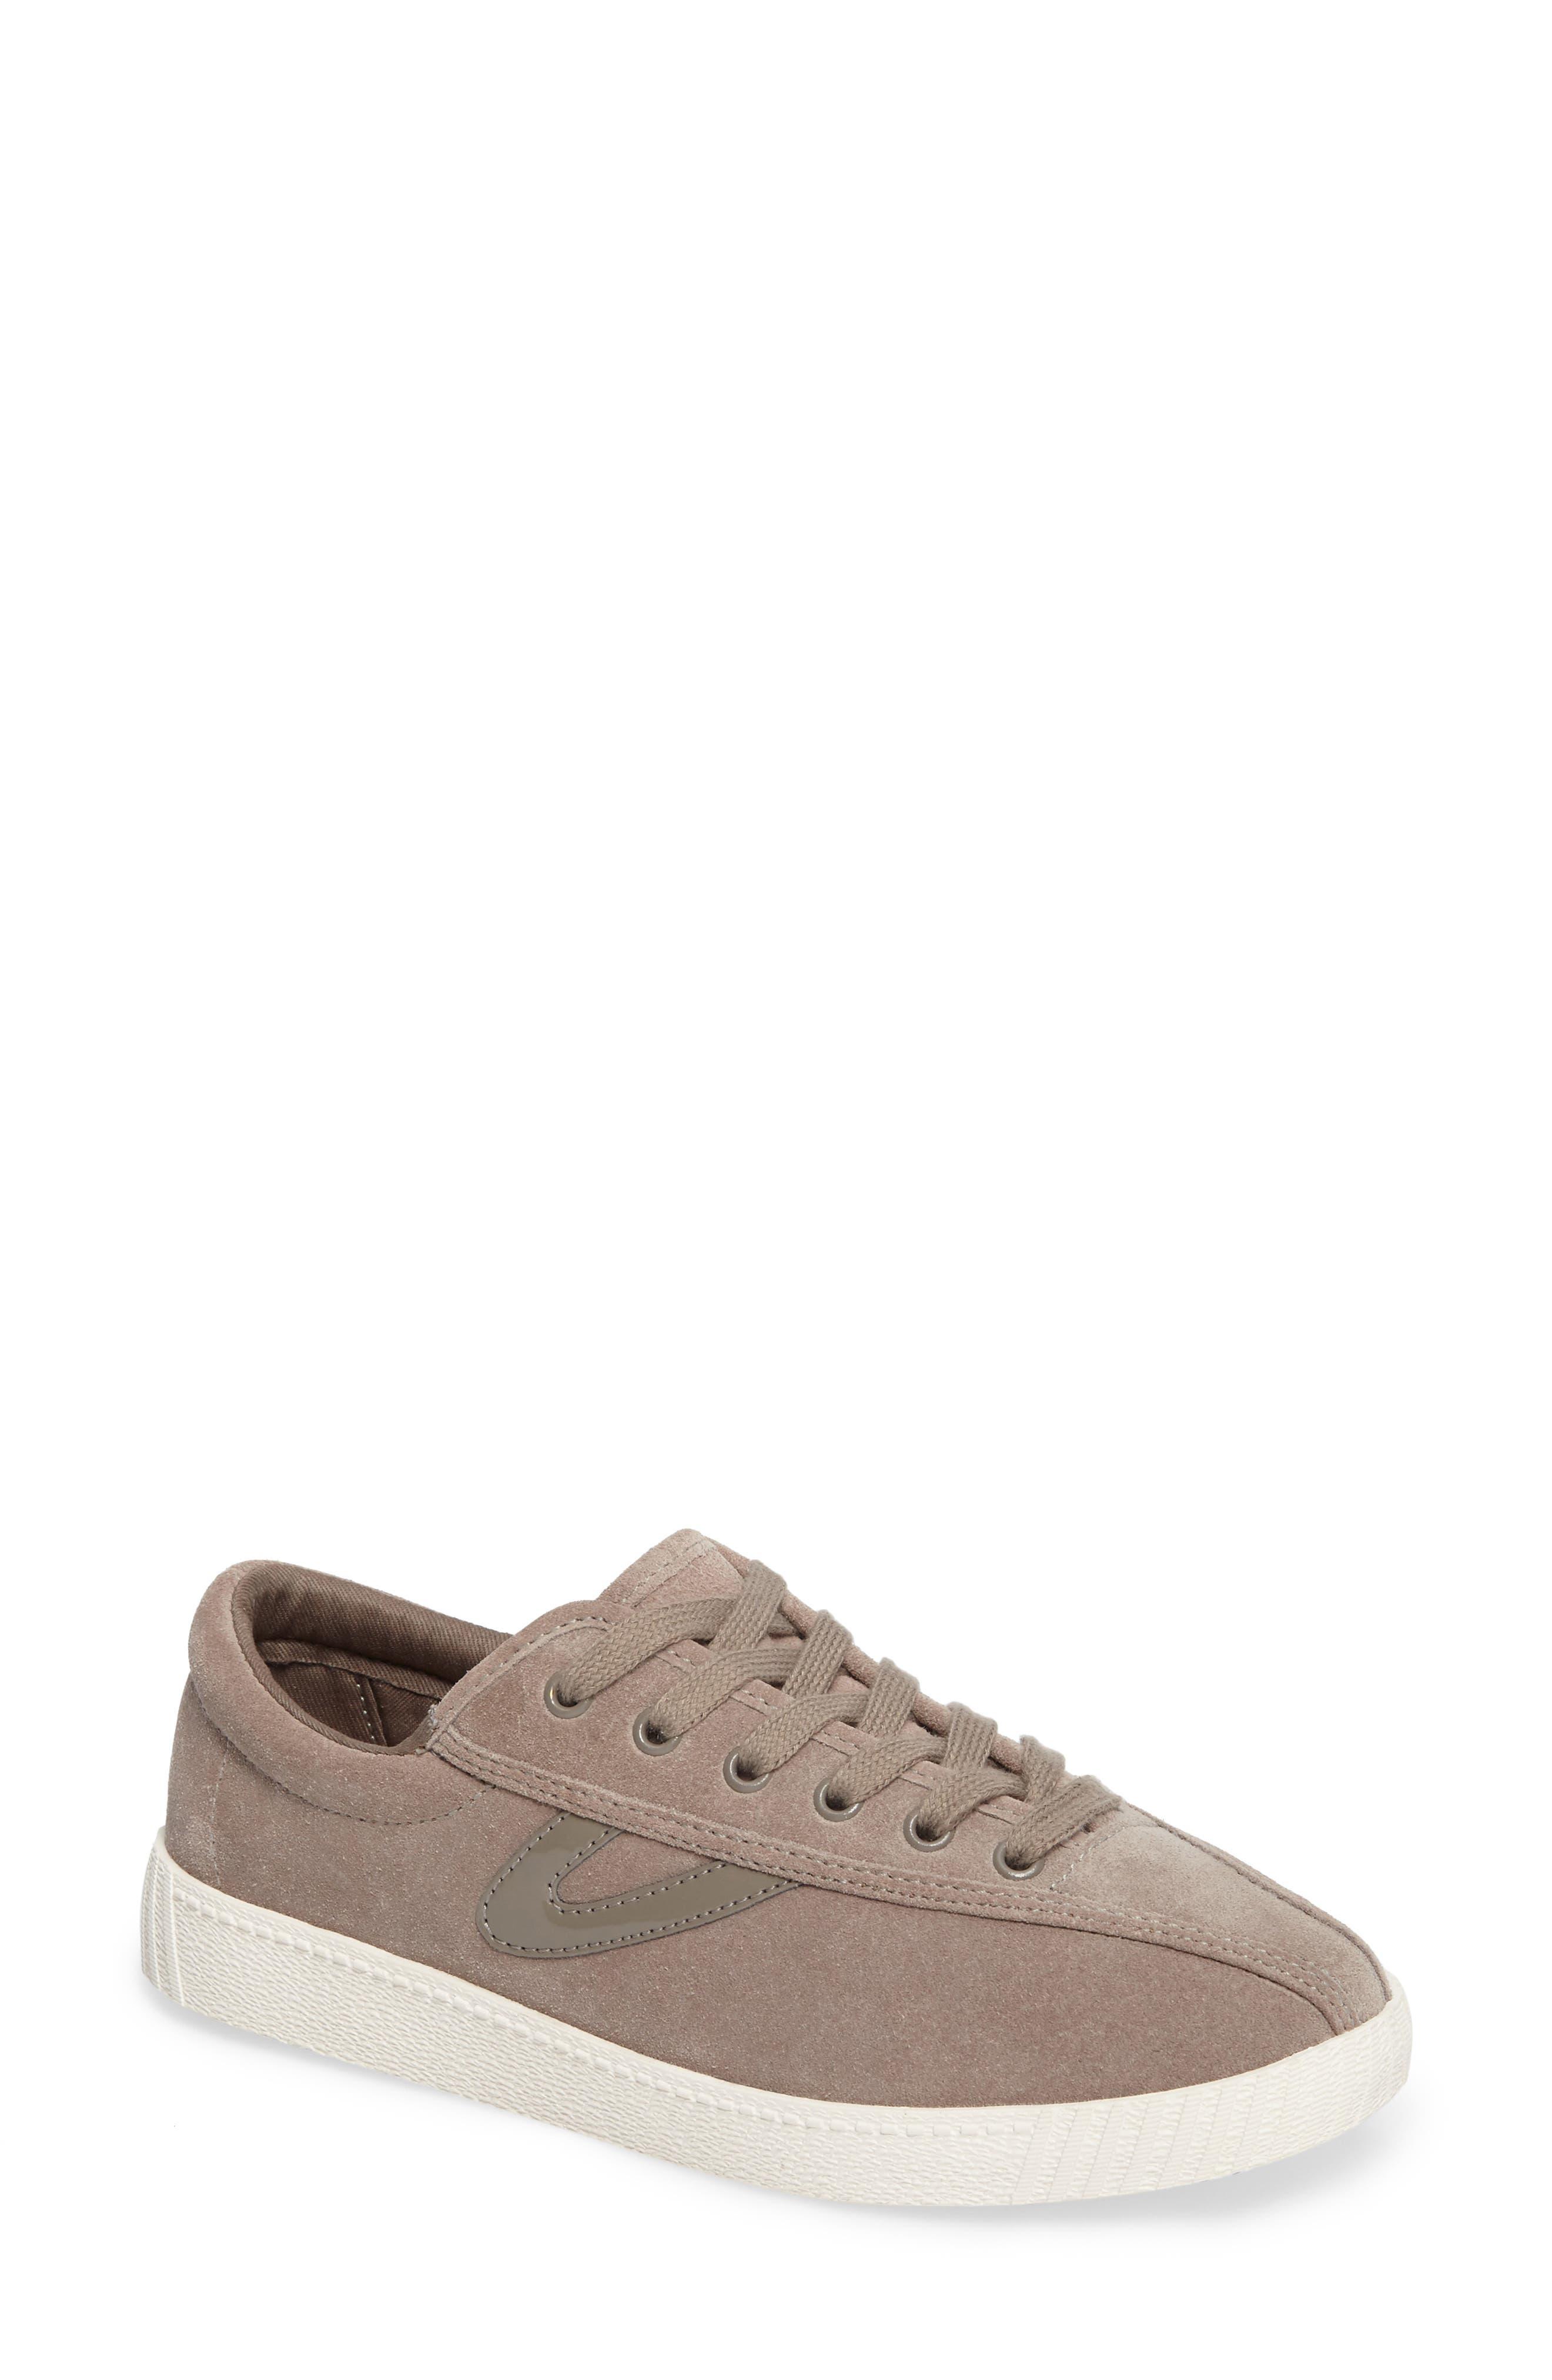 Alternate Image 1 Selected - Tretorn 'Nylite2 Plus' Sneaker (Women)